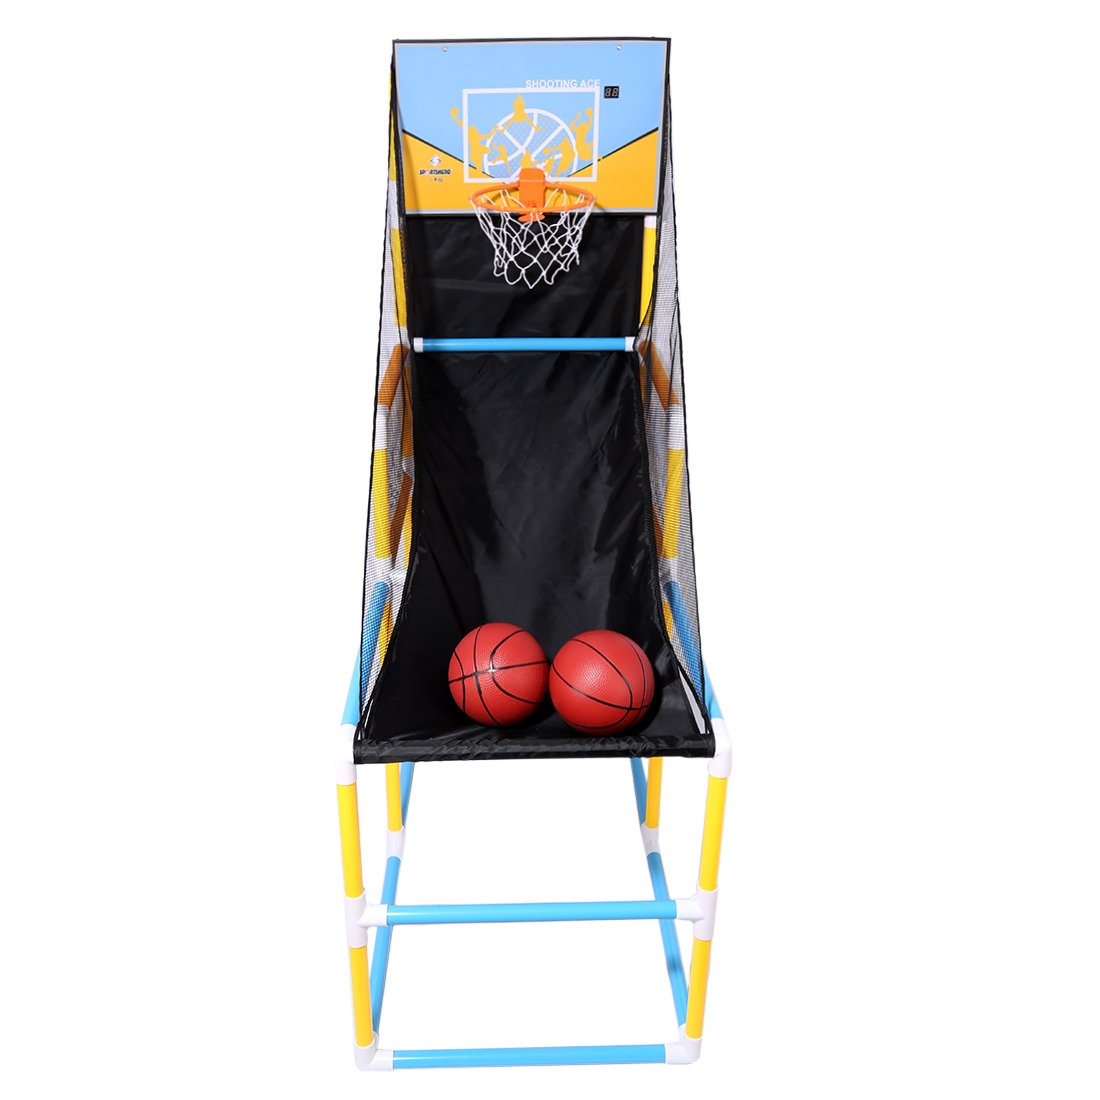 PINCHUANGHUI Automatic Scoring Basketball Shooting Machine Kids Teenagers Shooting Hoop by PINCHUANGHUI (Image #4)